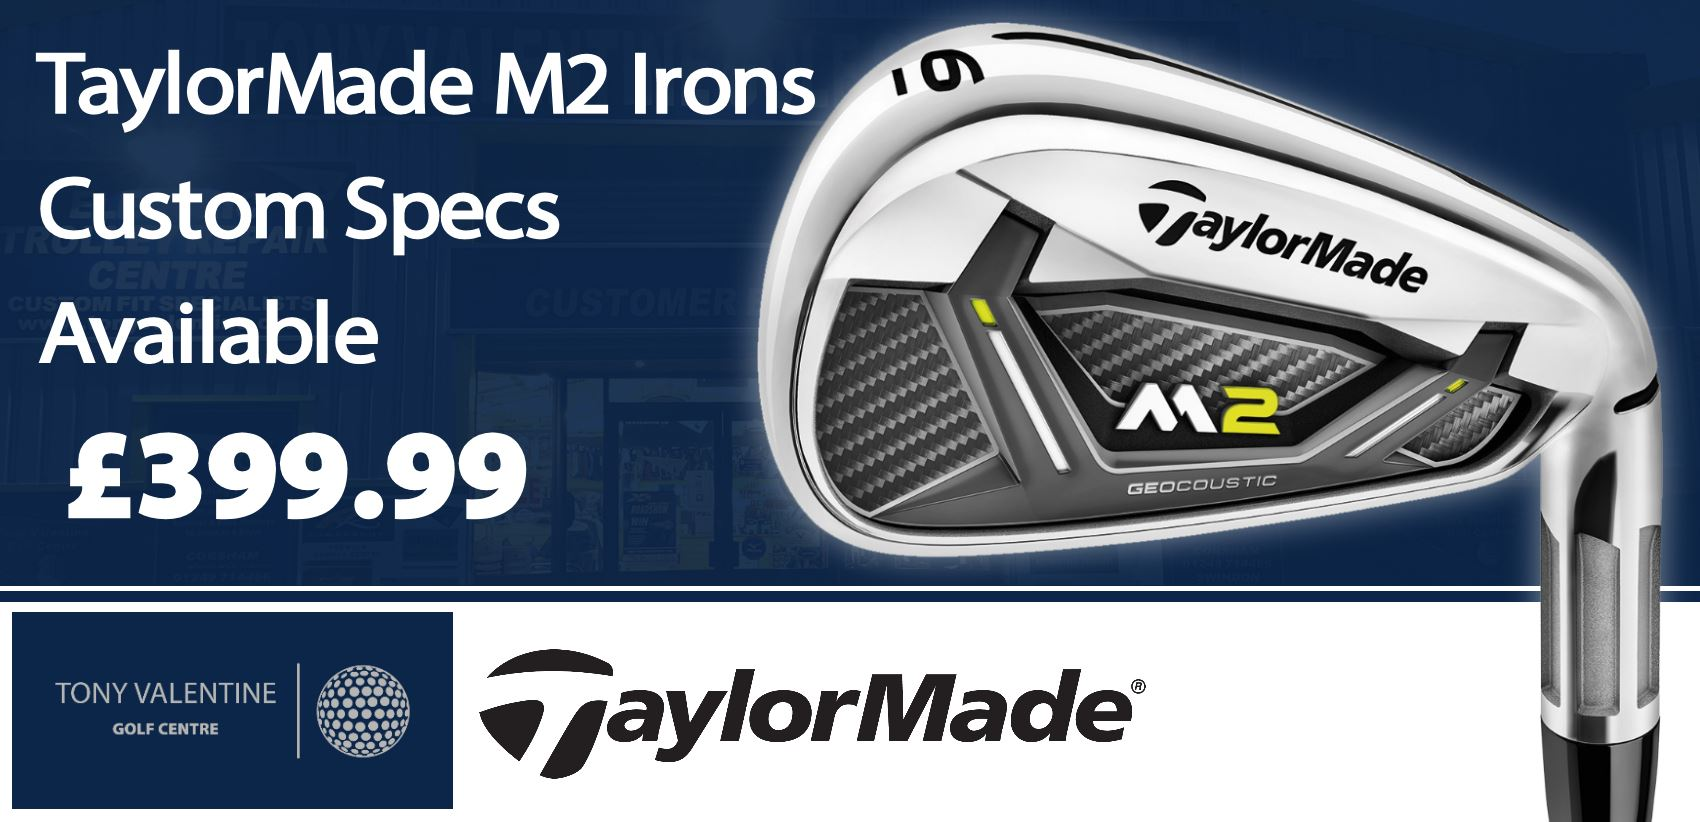 TaylorMade M2 Custom Irons